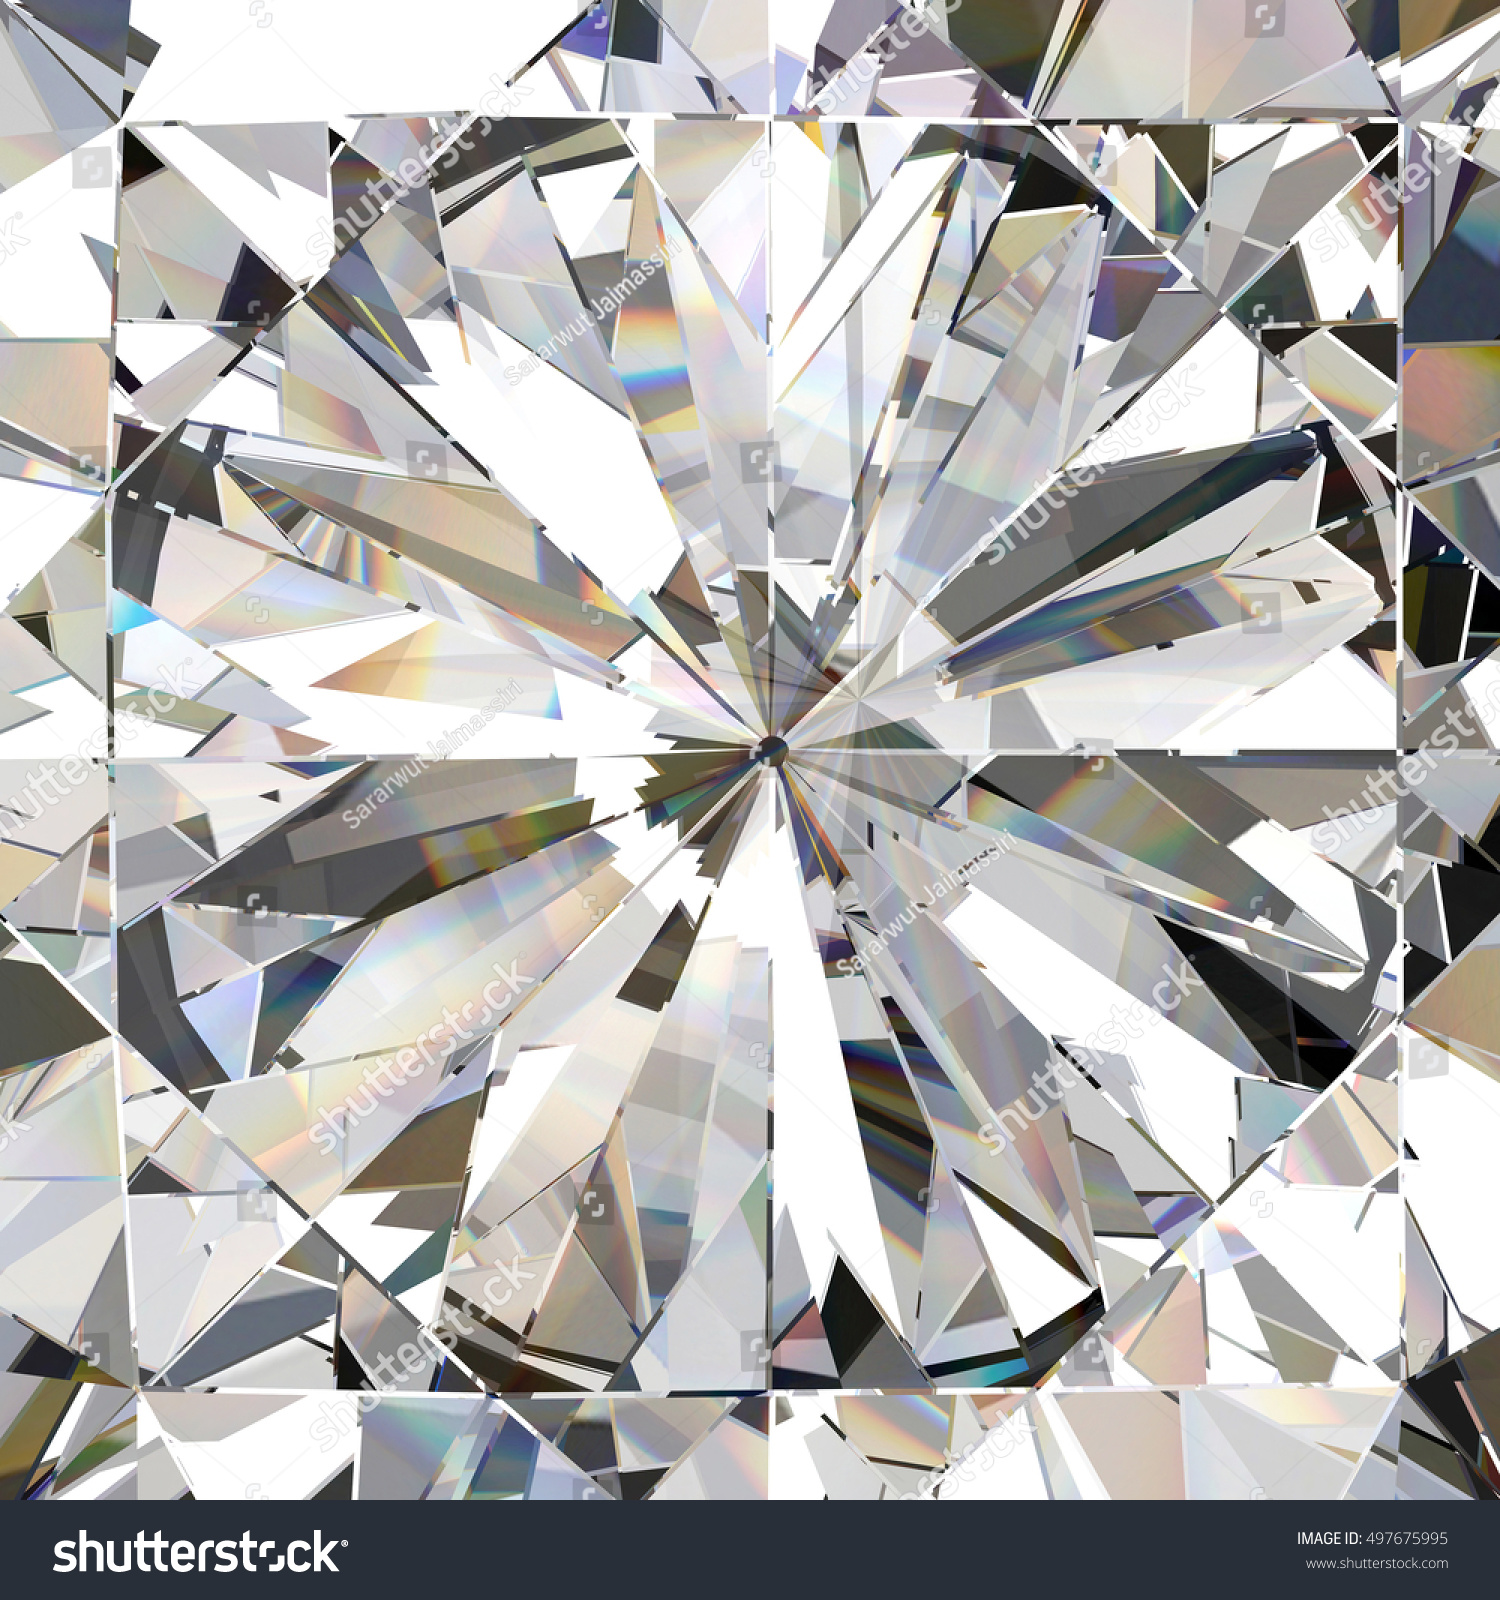 Realistic Diamond Caustic Close Texture 3d Stock Illustration 497675995 - Shutterstock